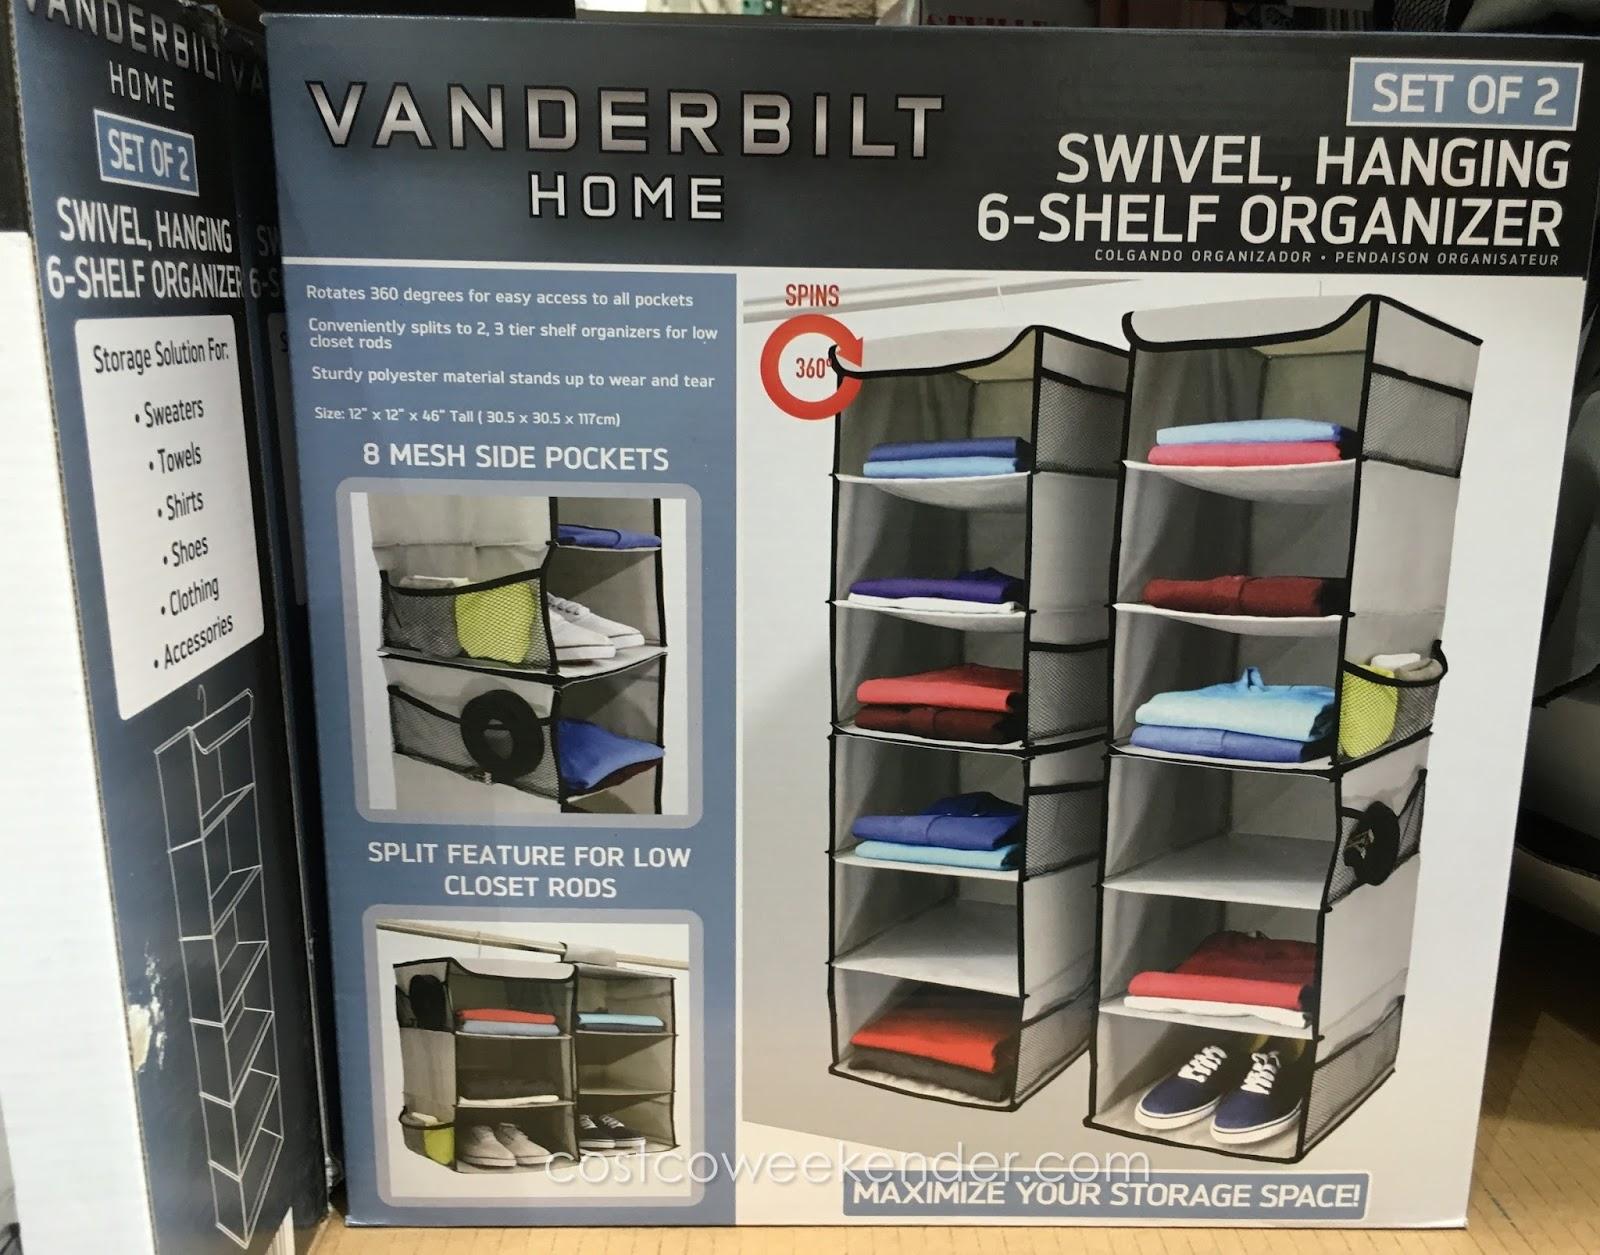 Beau Create More Space With The Vanderbilt Home Swivel, Hanging 6 Shelf Closet  Organizer